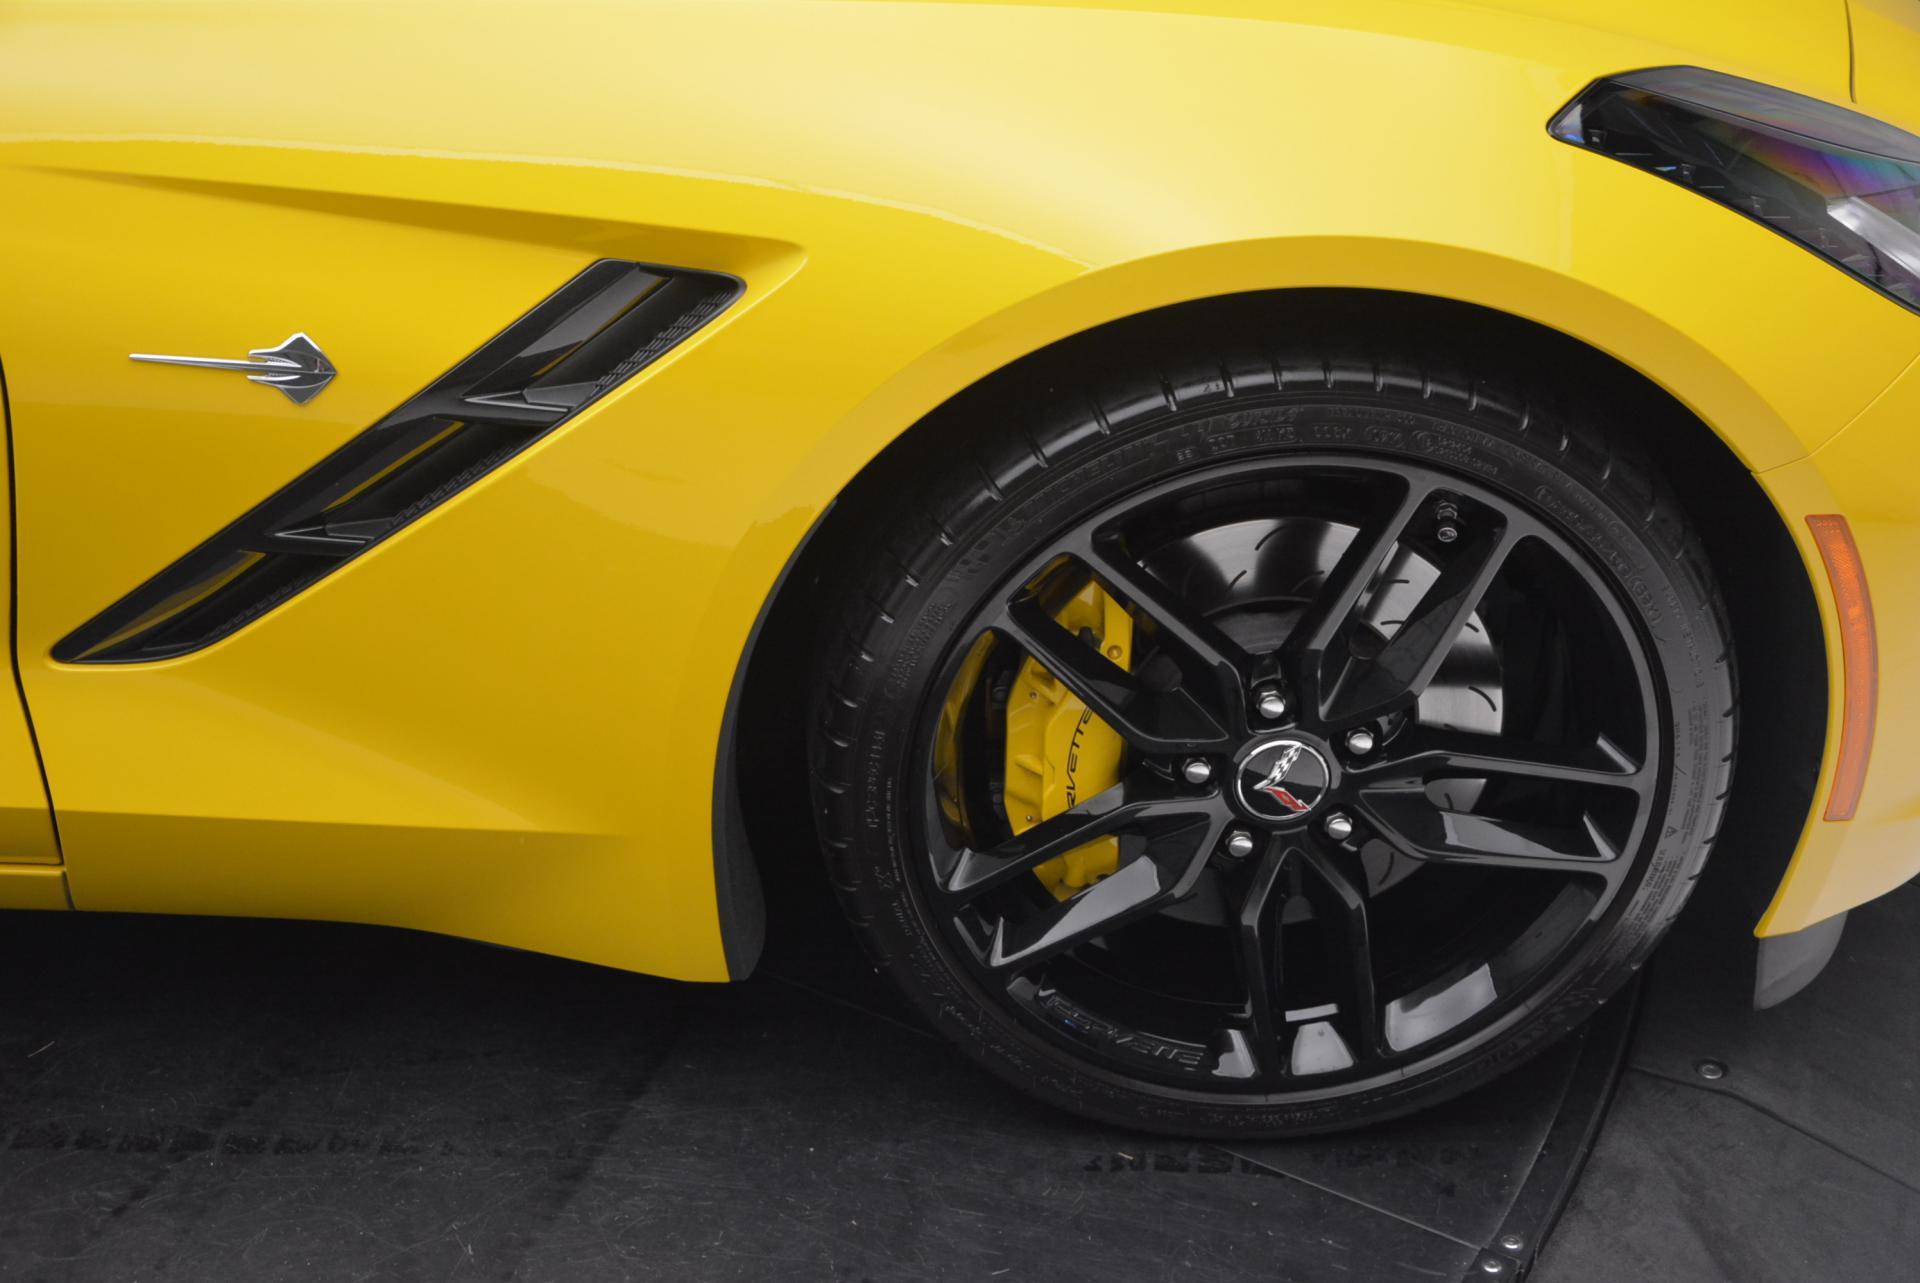 Used 2014 Chevrolet Corvette Stingray Z51 For Sale In Greenwich, CT 523_p21